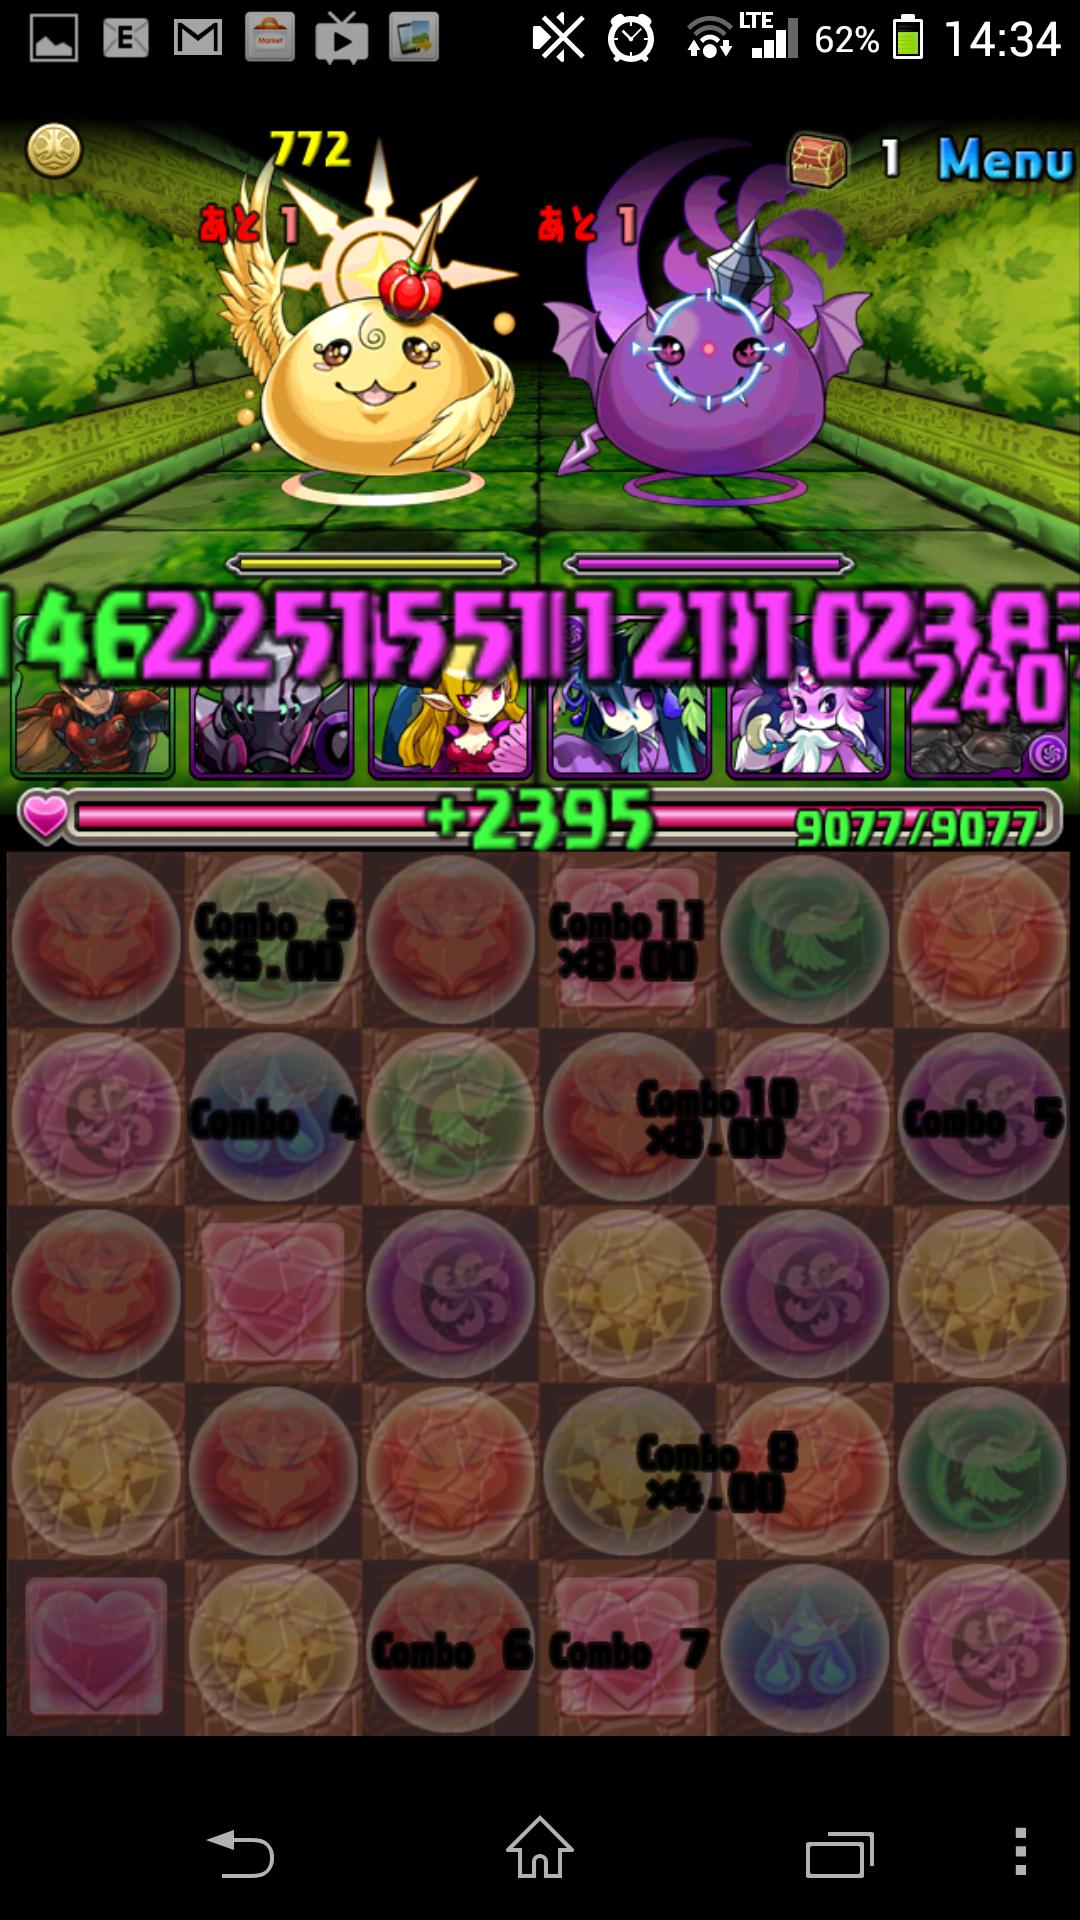 Screenshot_2014-04-01-14-34-02.png